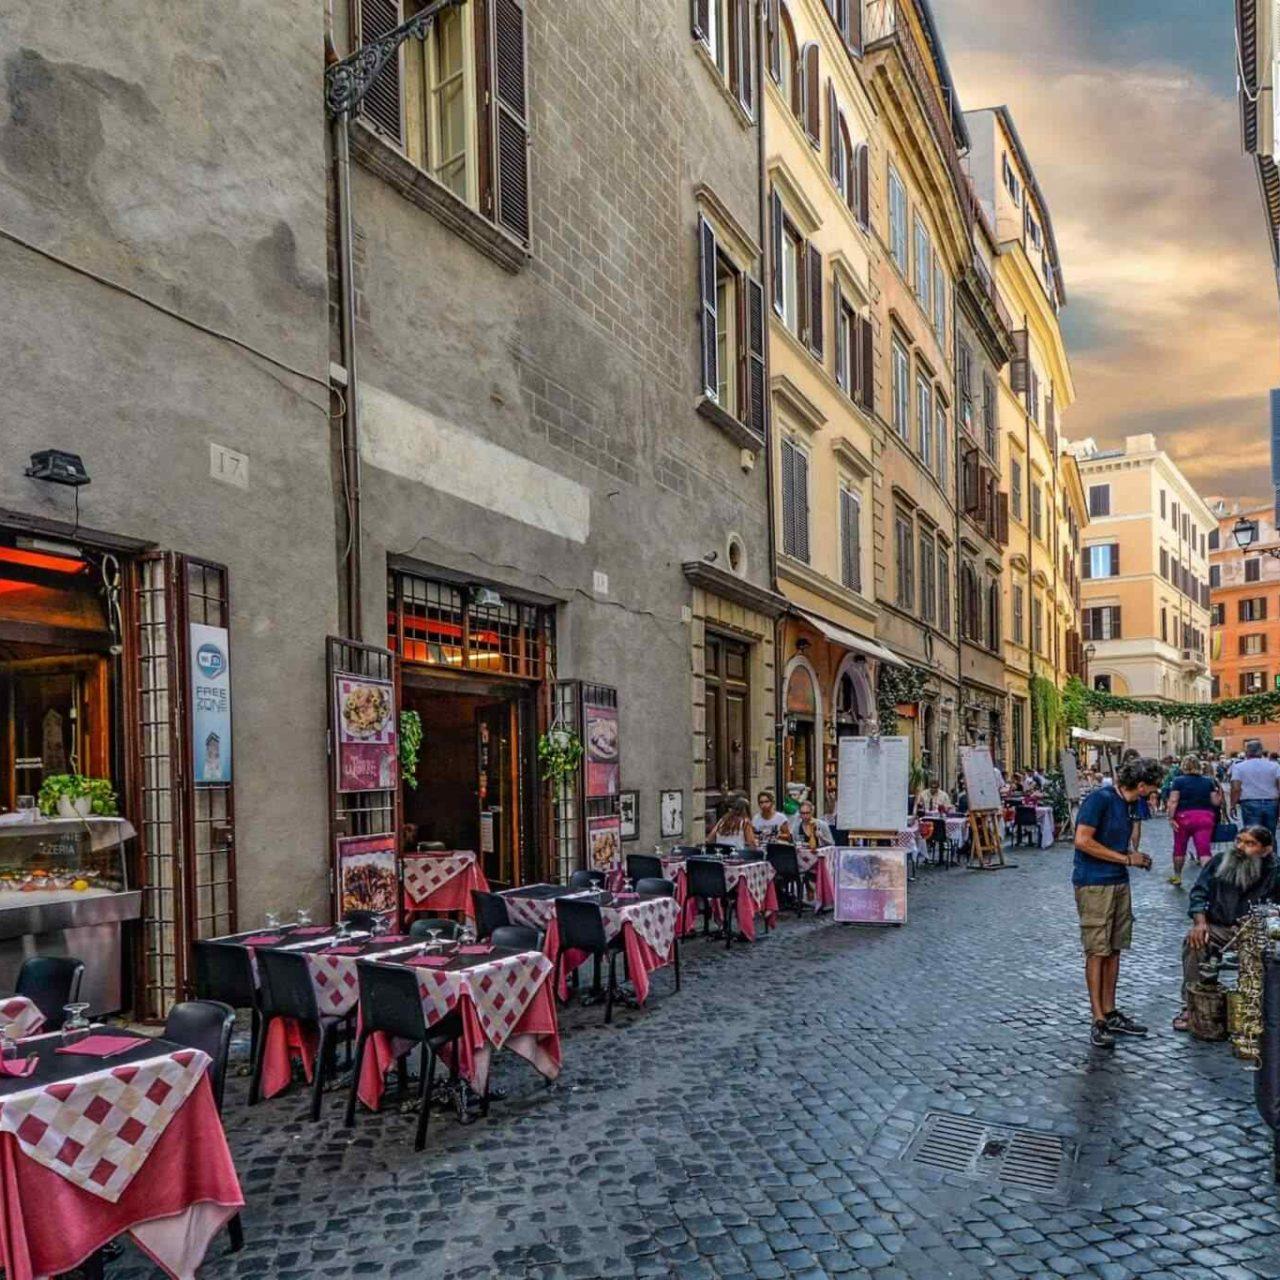 https://theglam.es/wp-content/uploads/2017/10/restaurant-italian-6-1280x1280.jpg